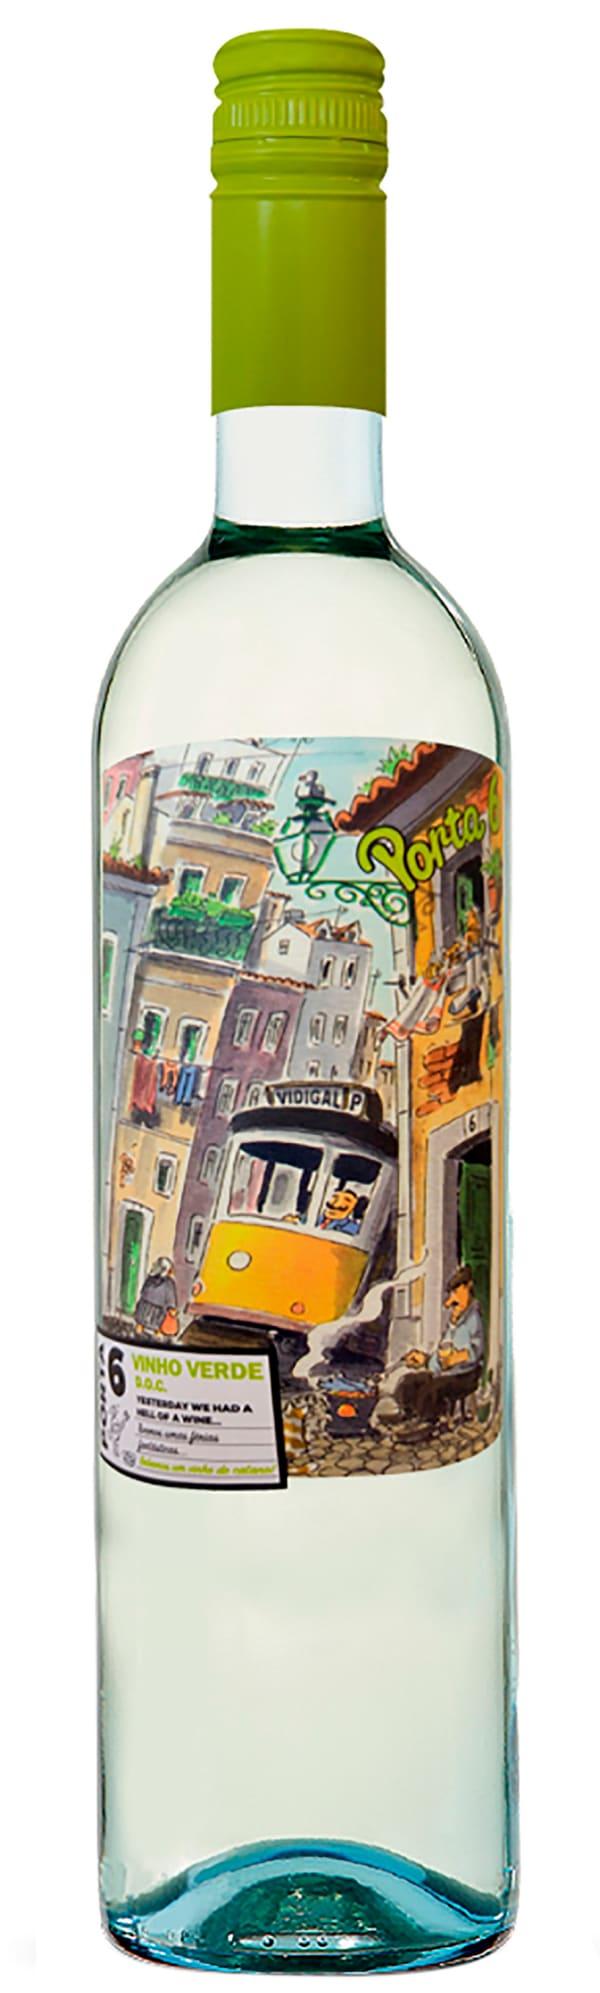 Porta 6 Vinho Verde 2017